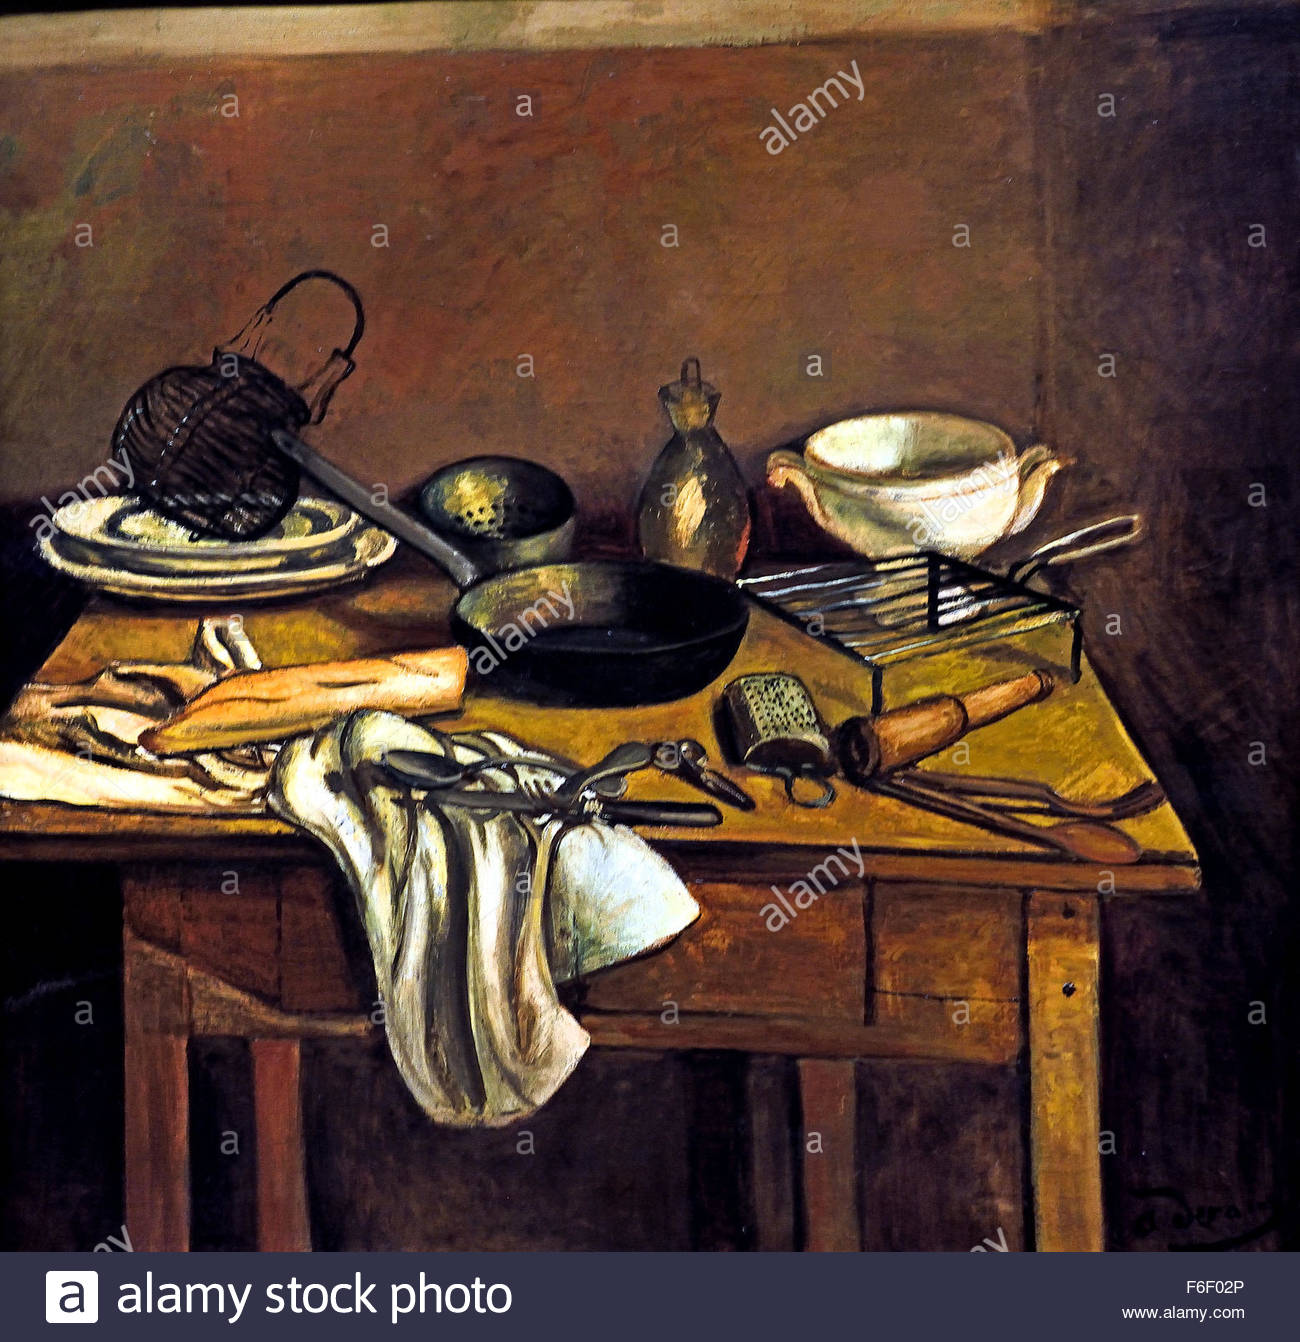 La Table De Cuisine The Kitchen Table In 1925 By Andre Derain